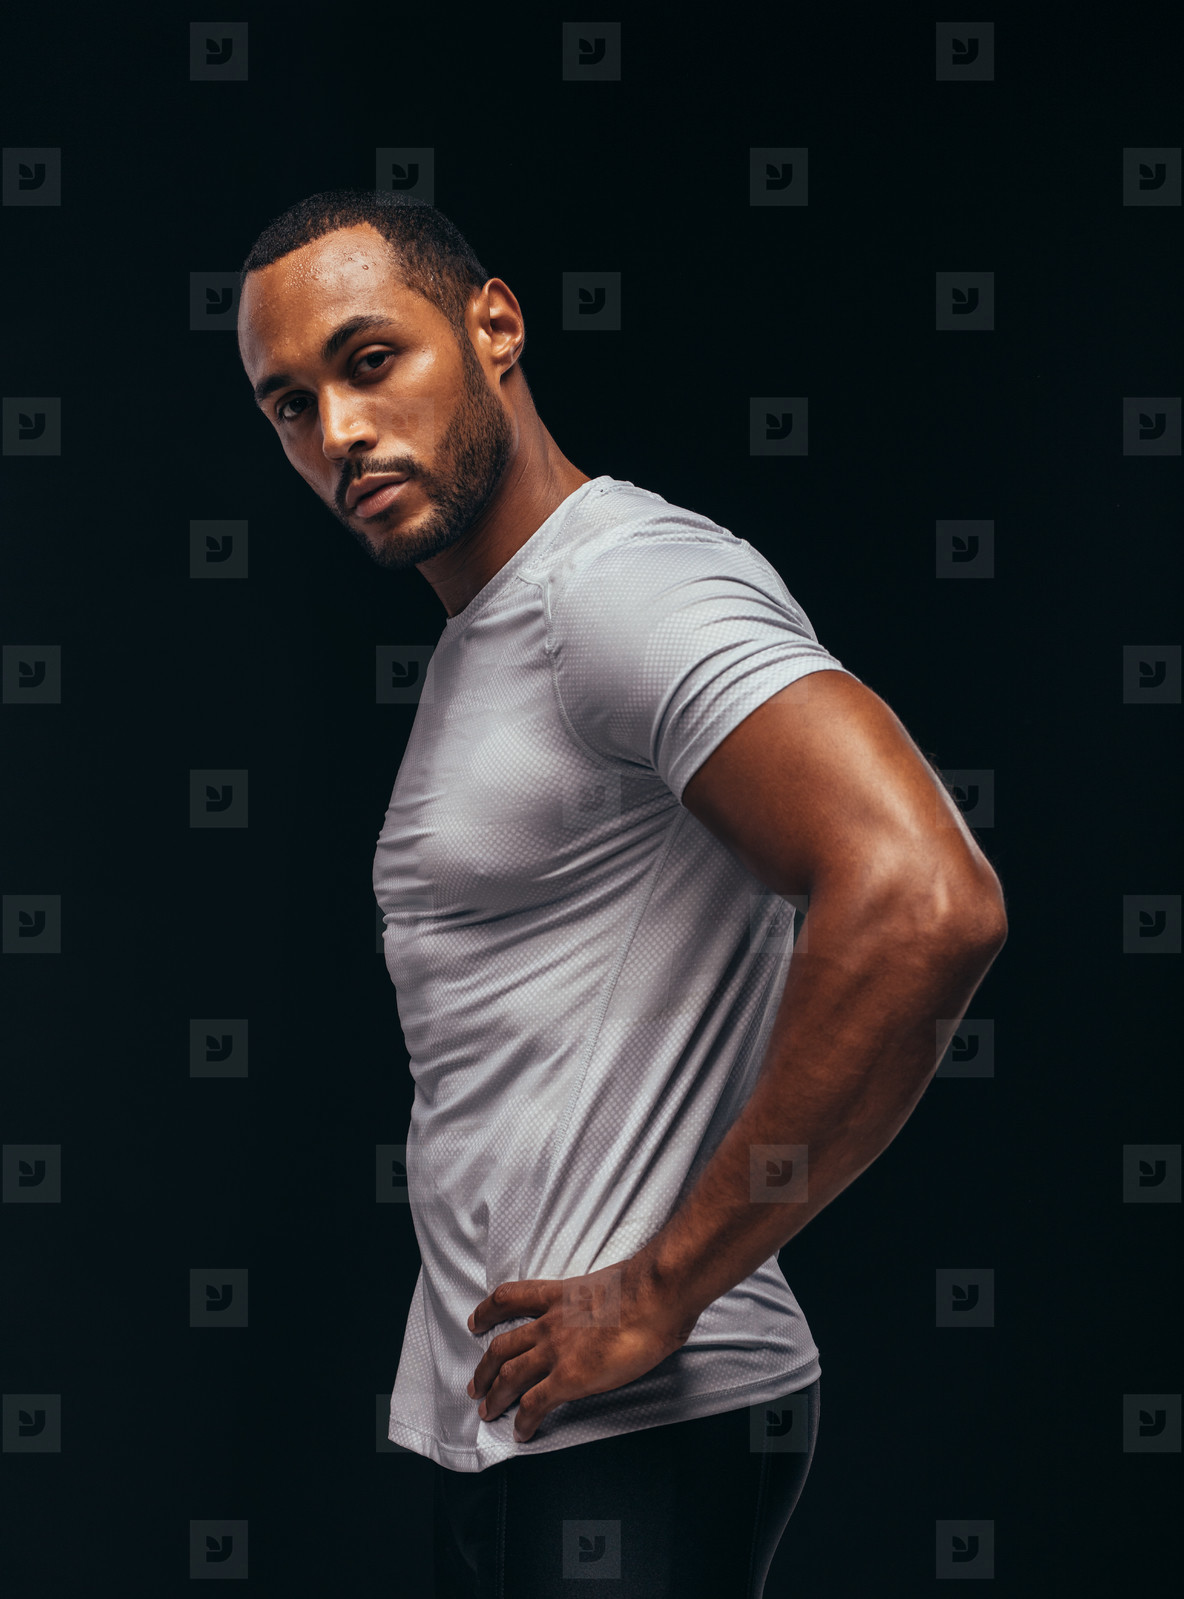 Monochrome fitness portrait of muscular athlete